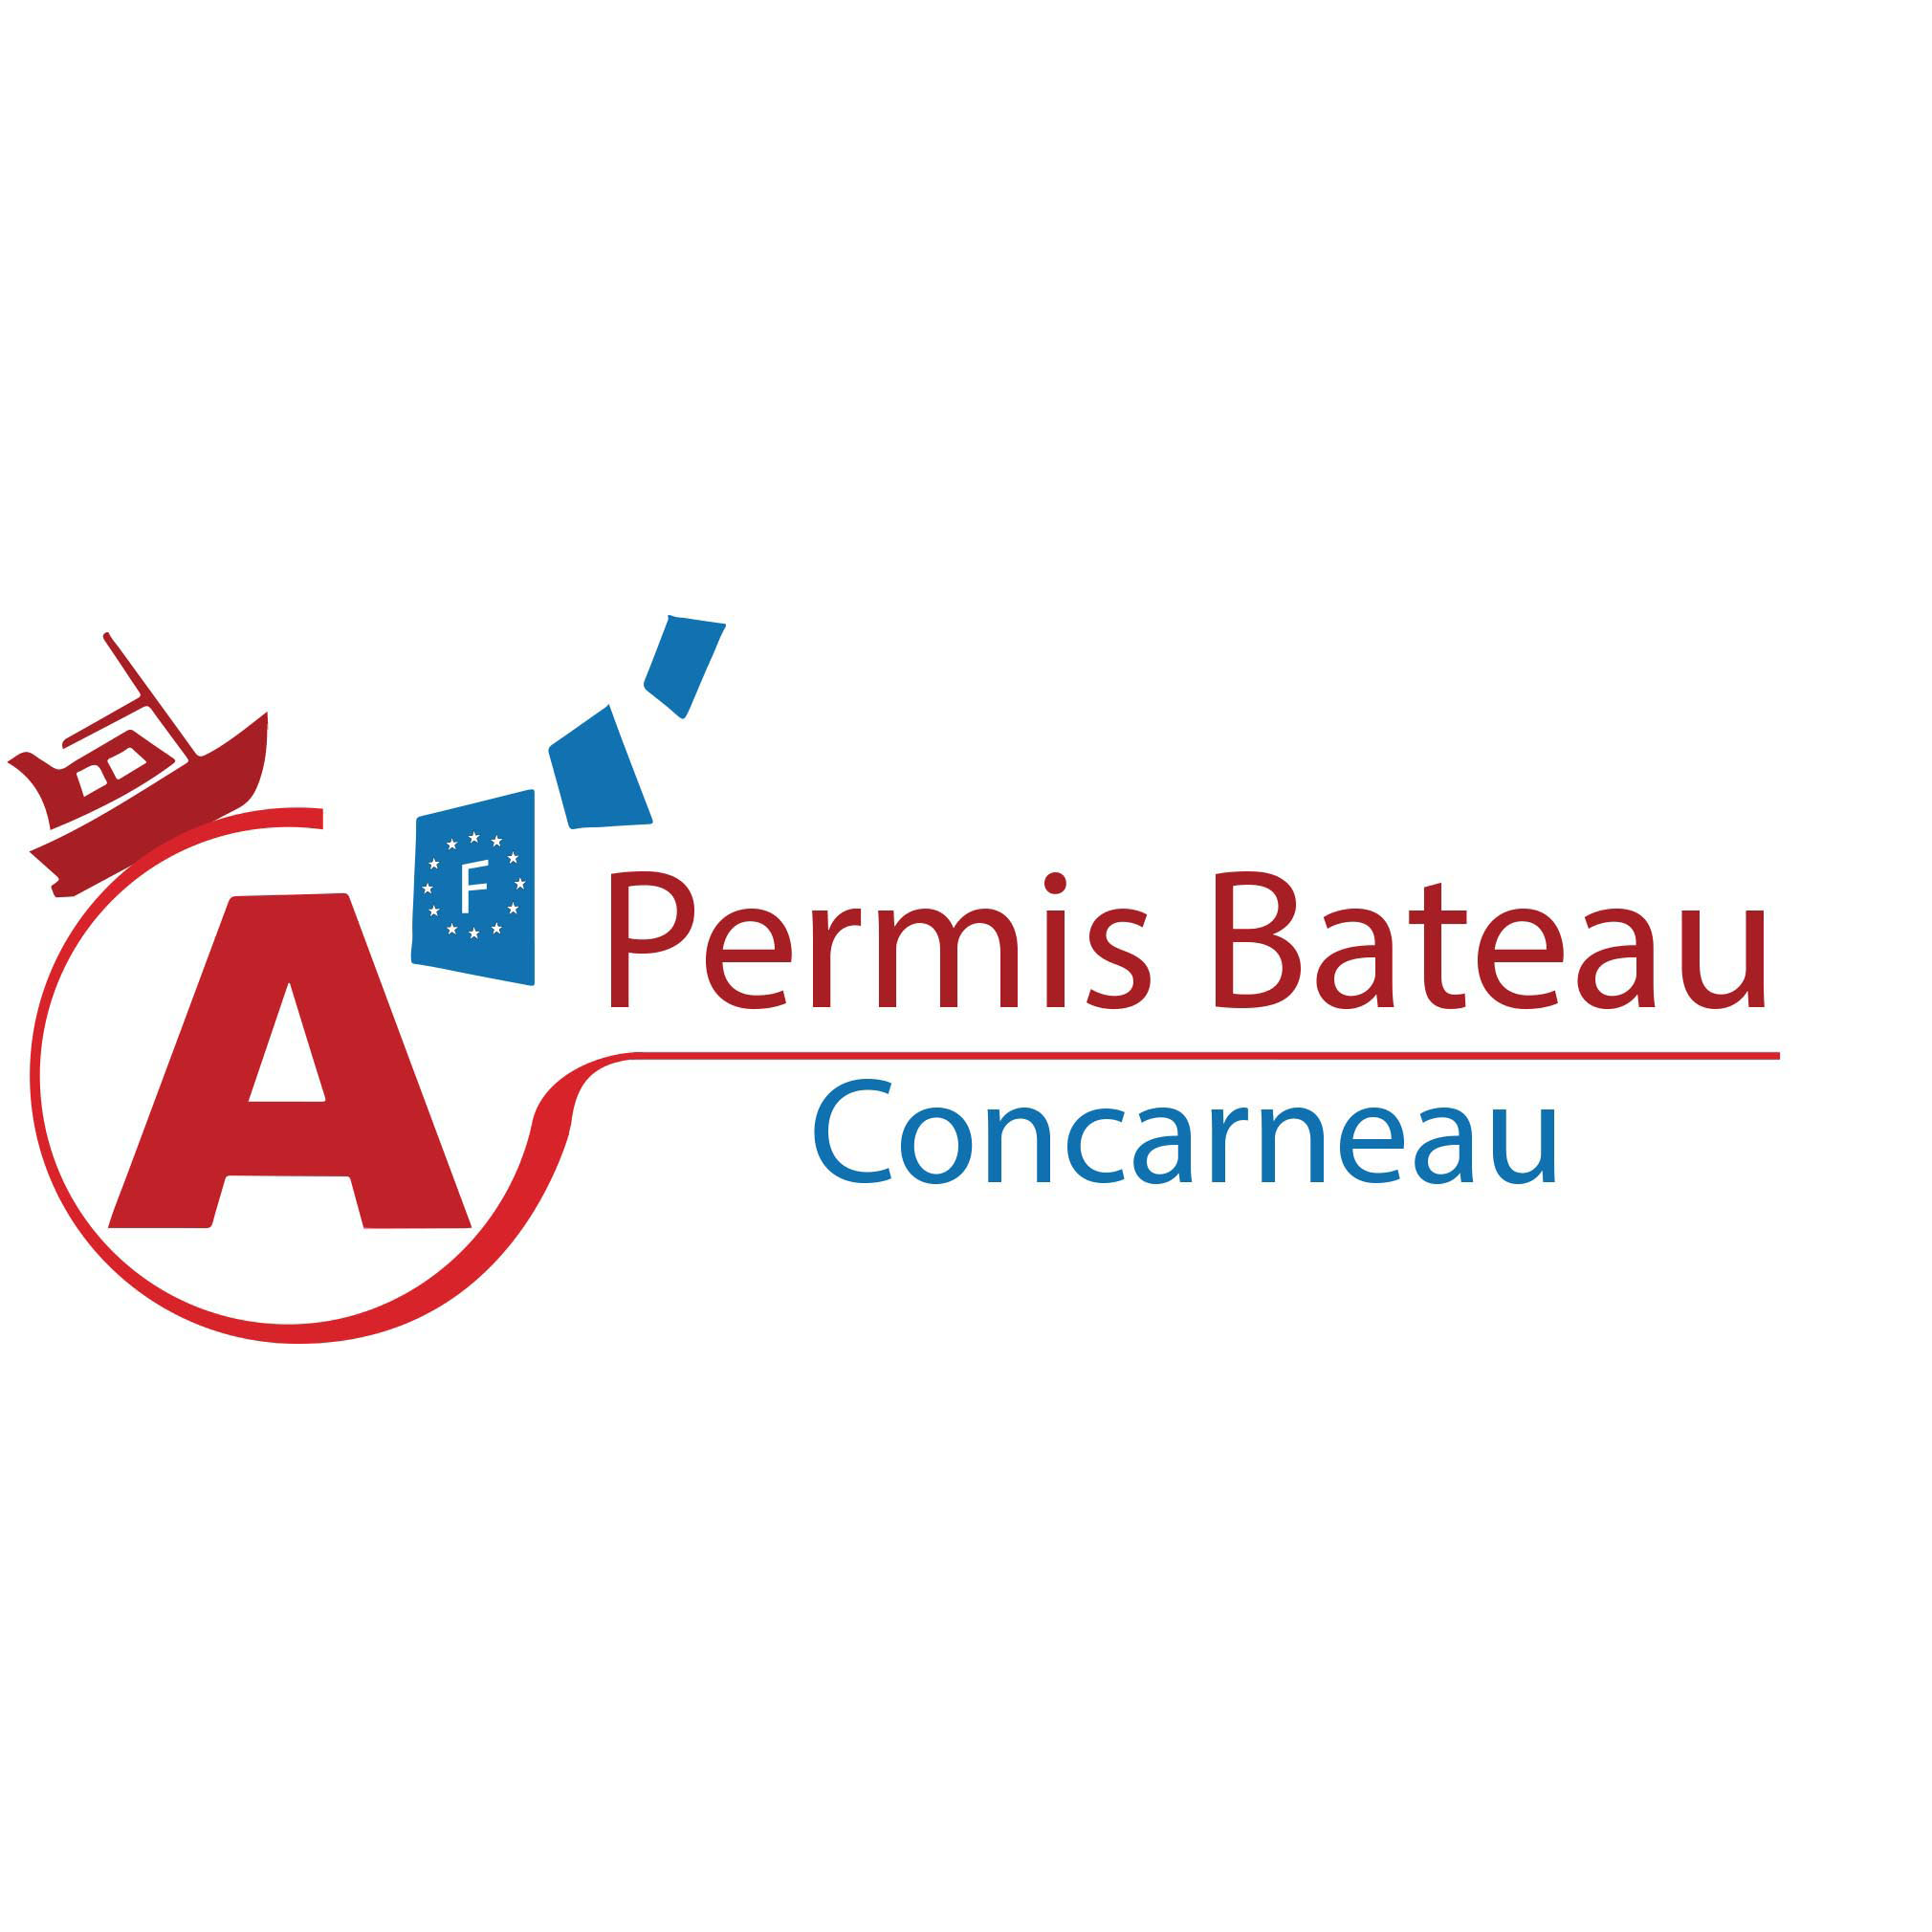 logo-permis-bateau-concarneau-150x150